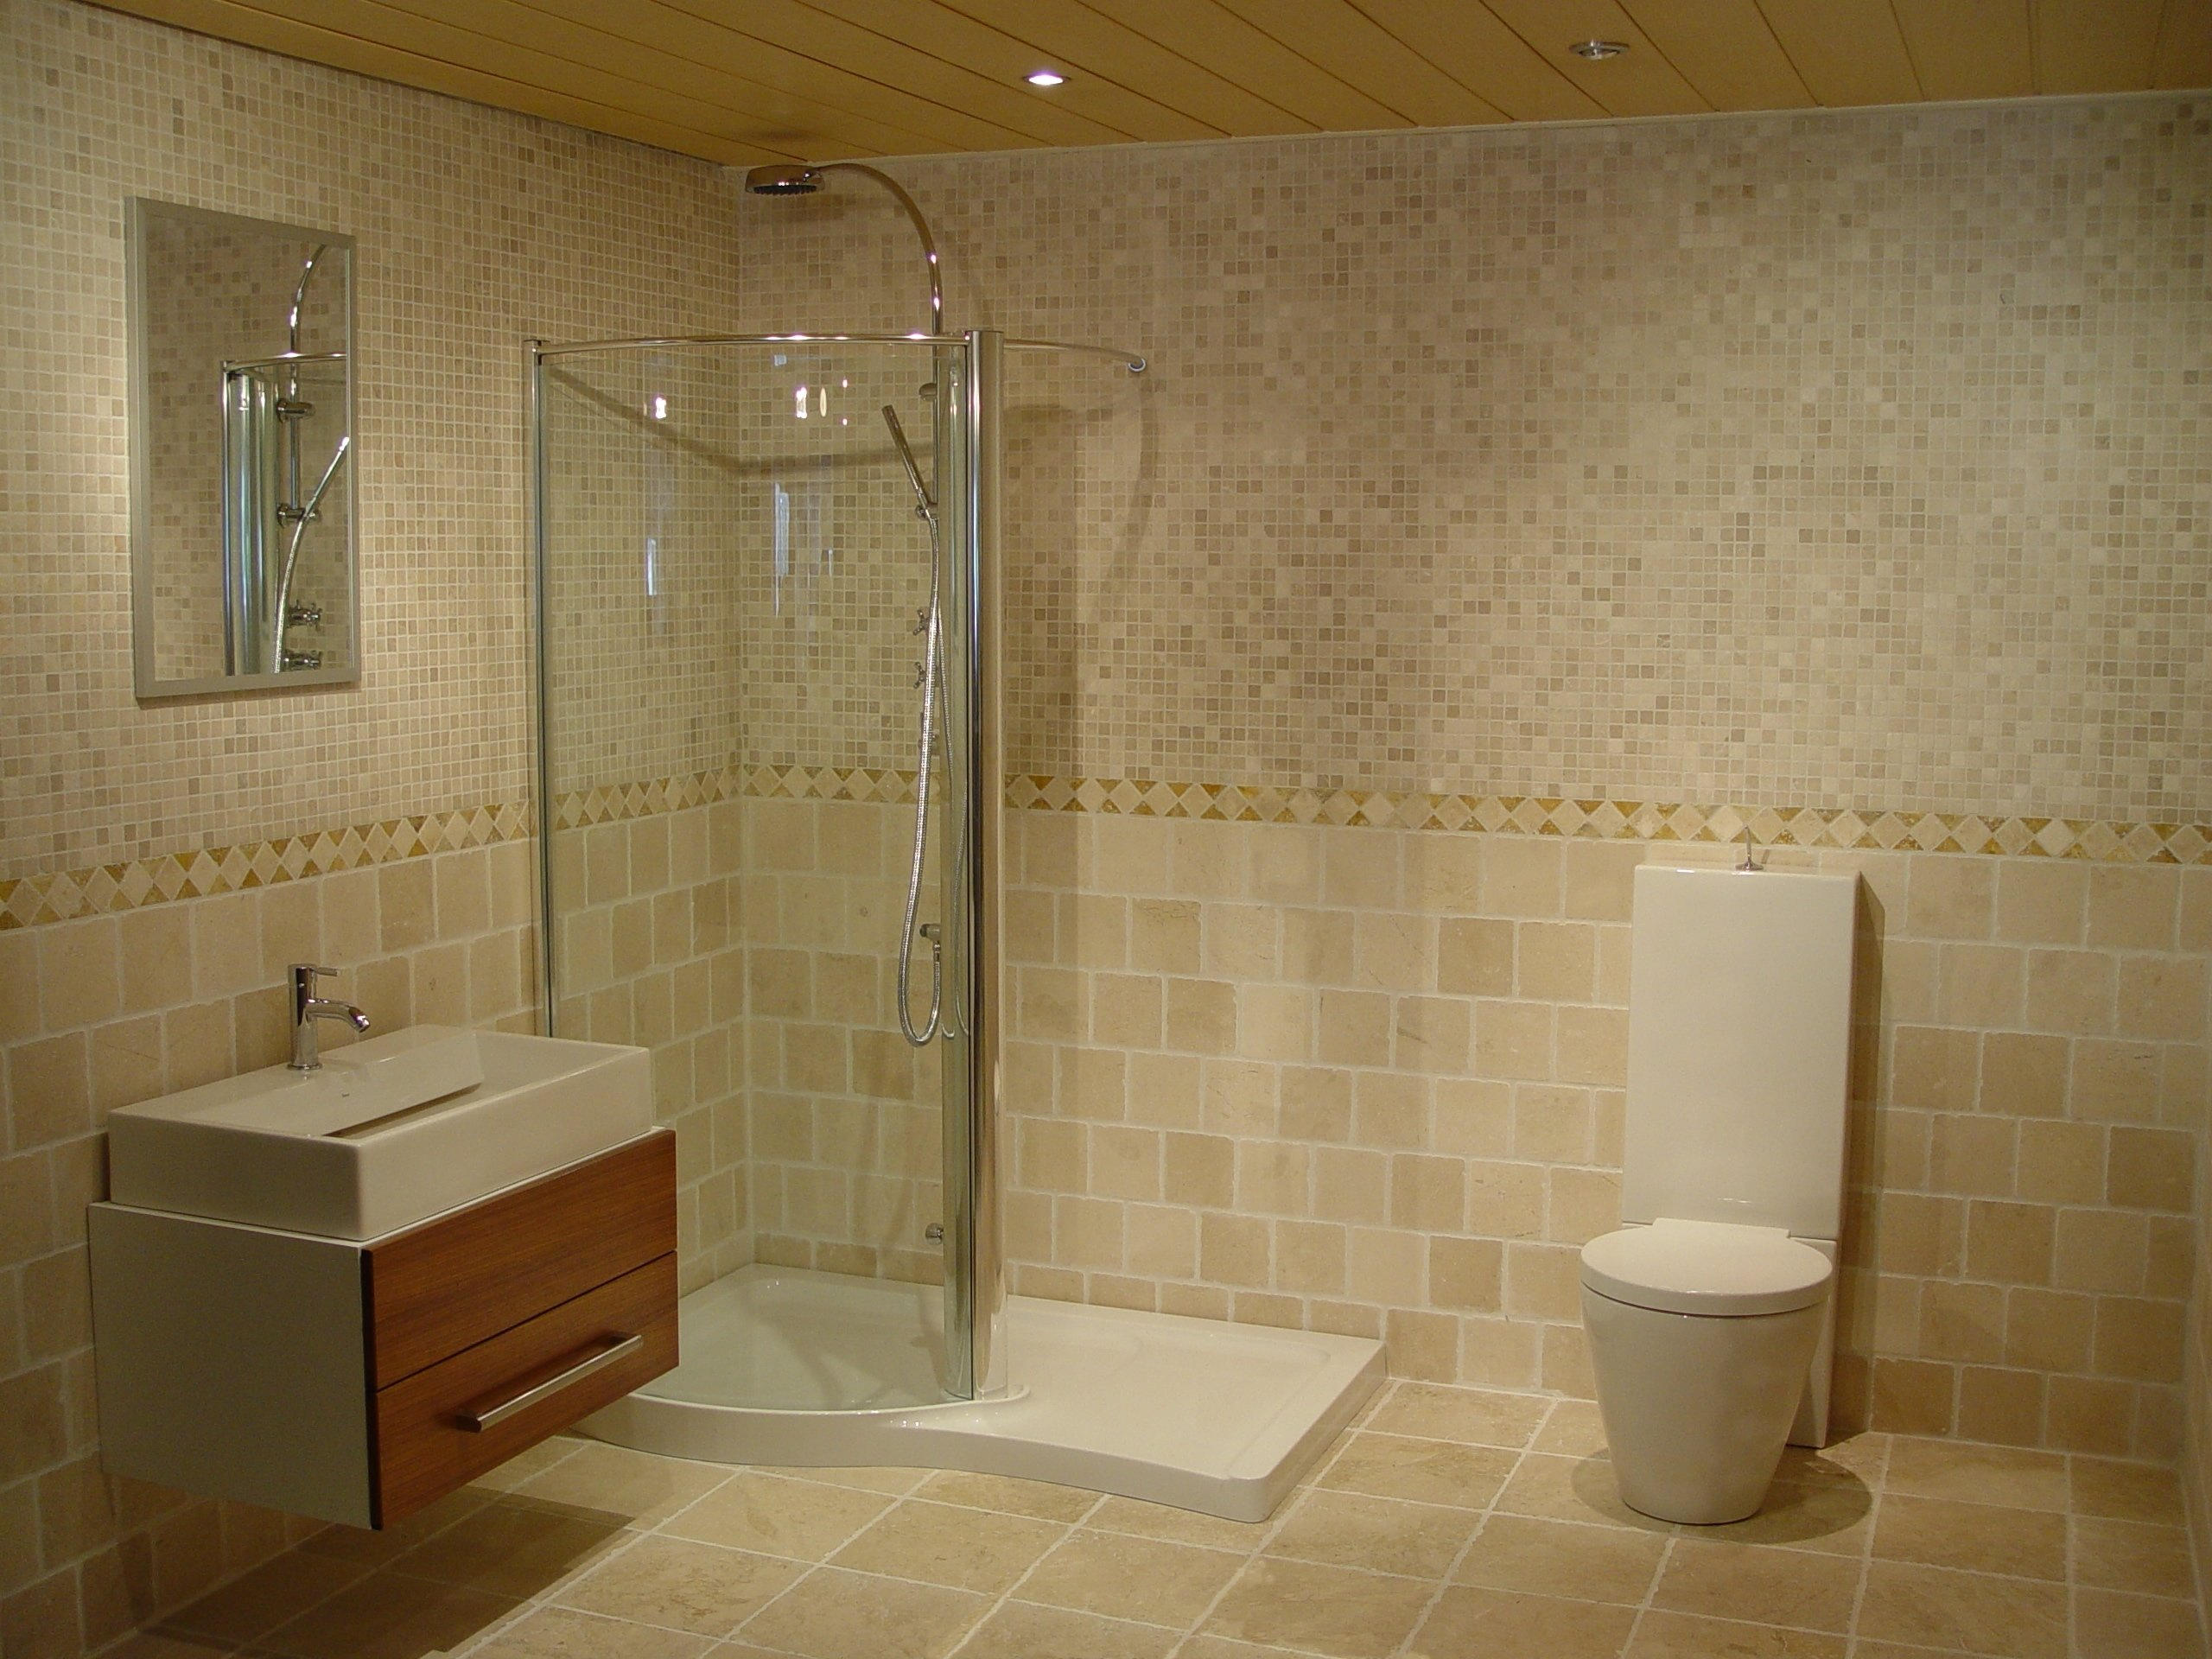 10 Amazing Bathroom Tile Ideas On A Budget good bathroom tile ideas for small bathrooms 74 in home office 2020